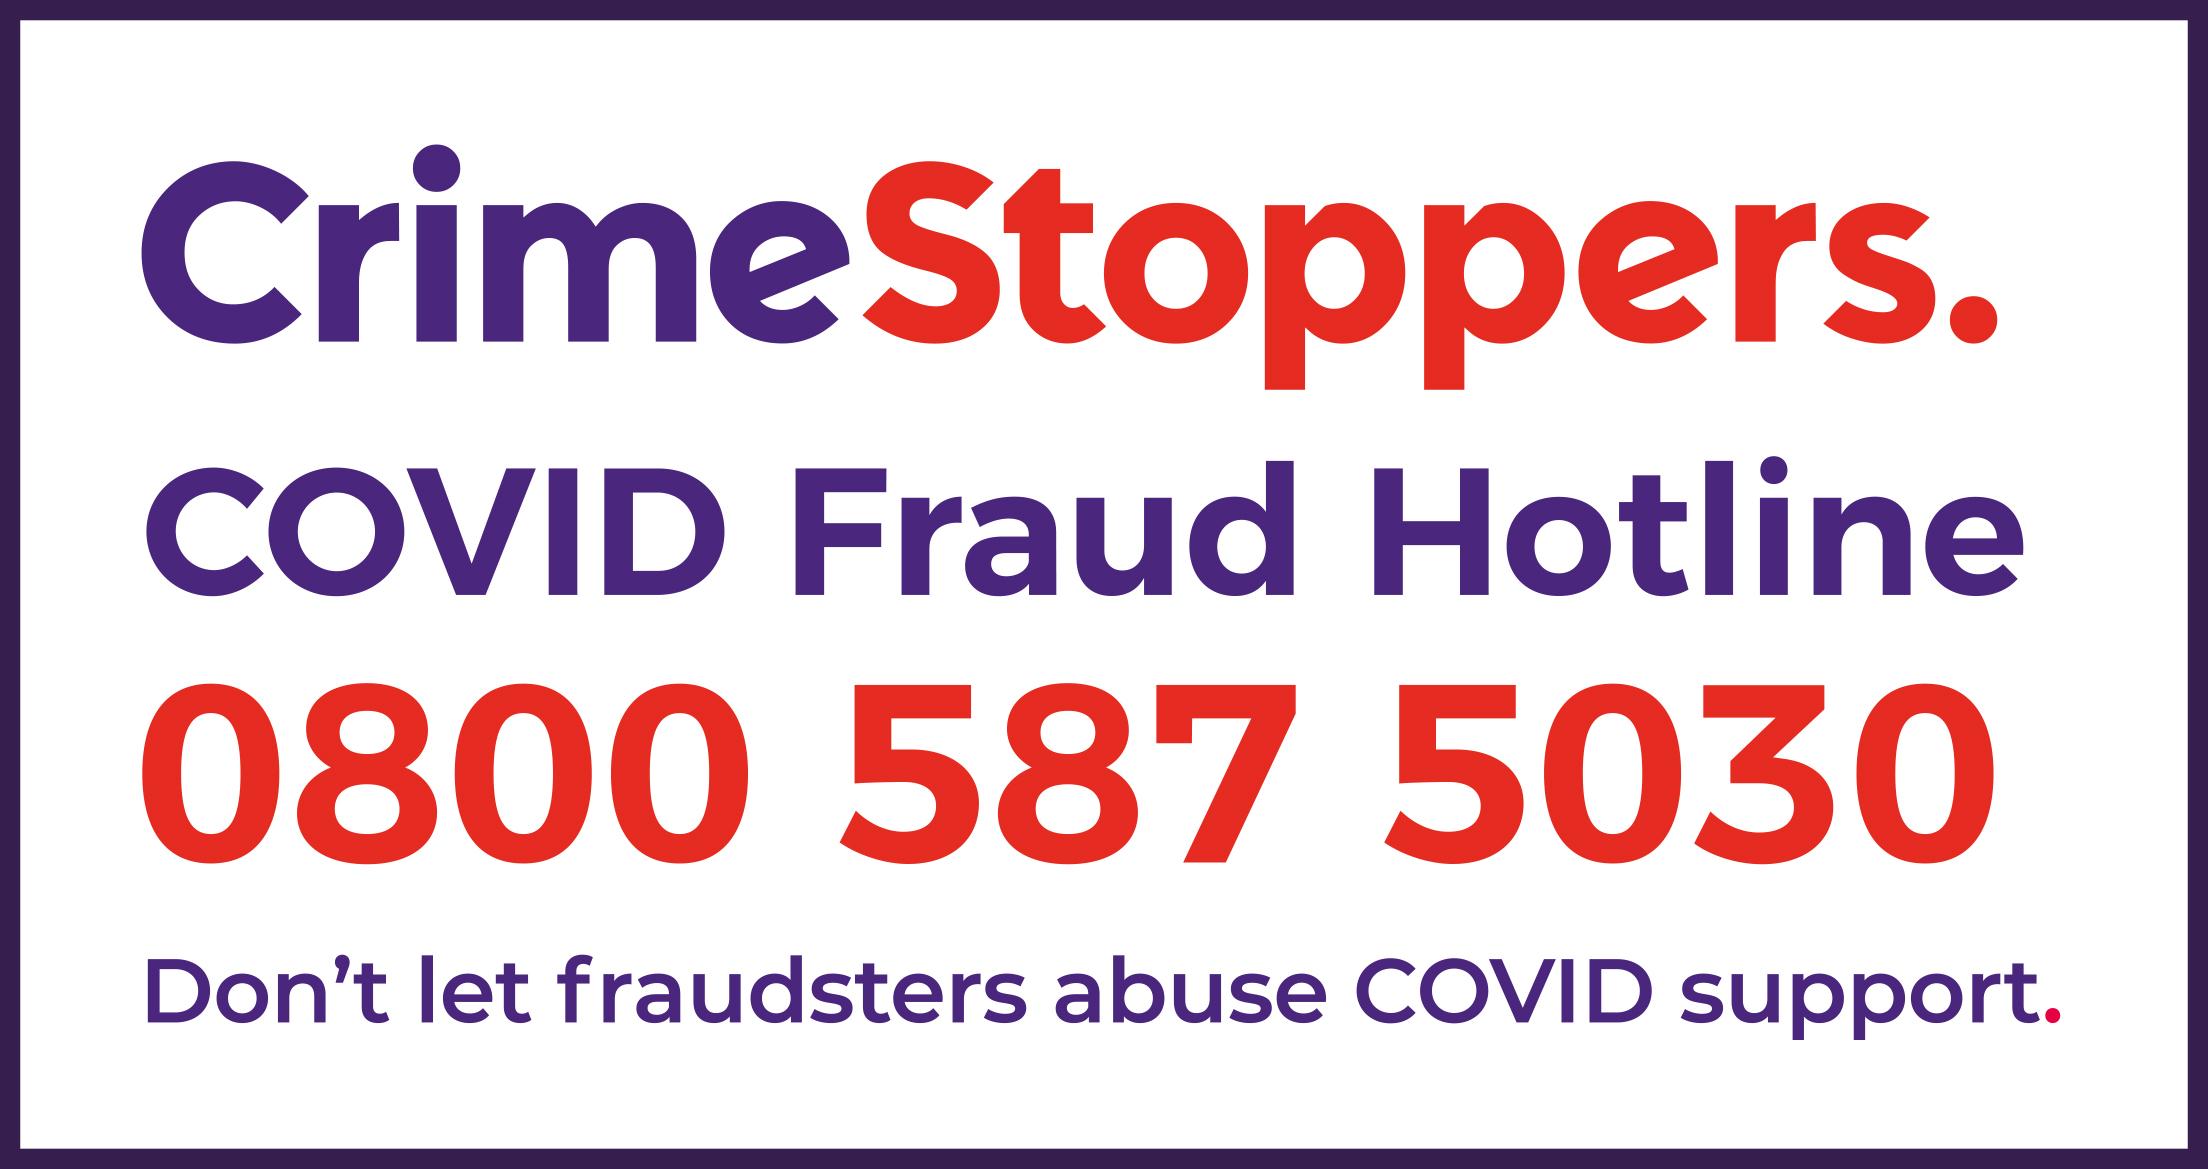 Crimestoppers Covid Fraud Hotline